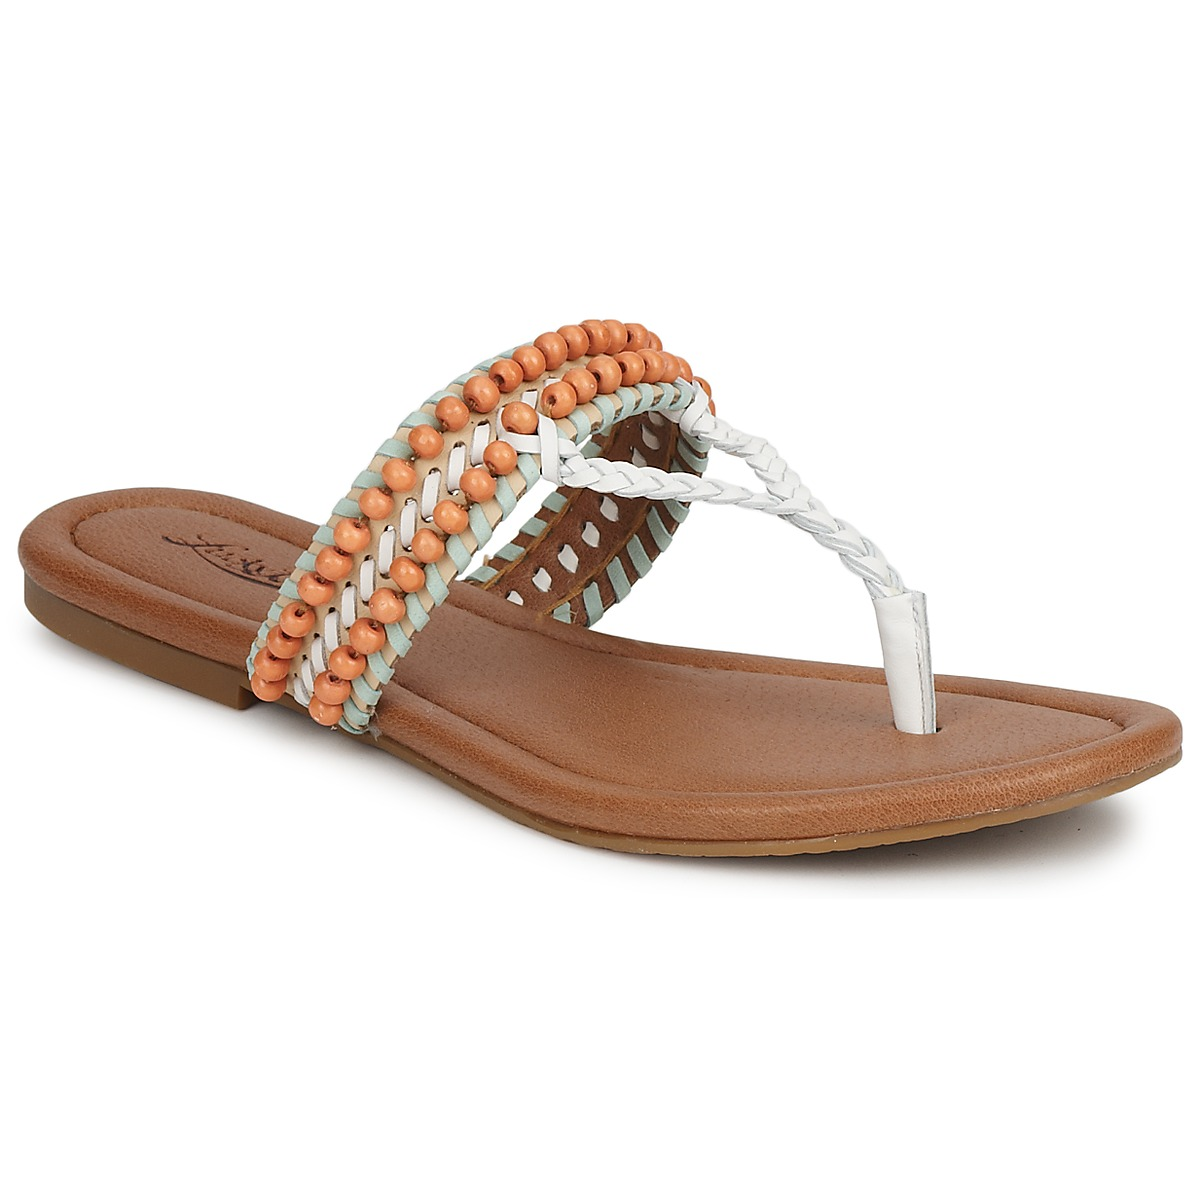 Lucky Brand DOLLIS Weiss / Schwarz /indian magente - Kostenloser Versand bei Spartoode ! - Schuhe Sandalen / Sandaletten Damen 90,99 €